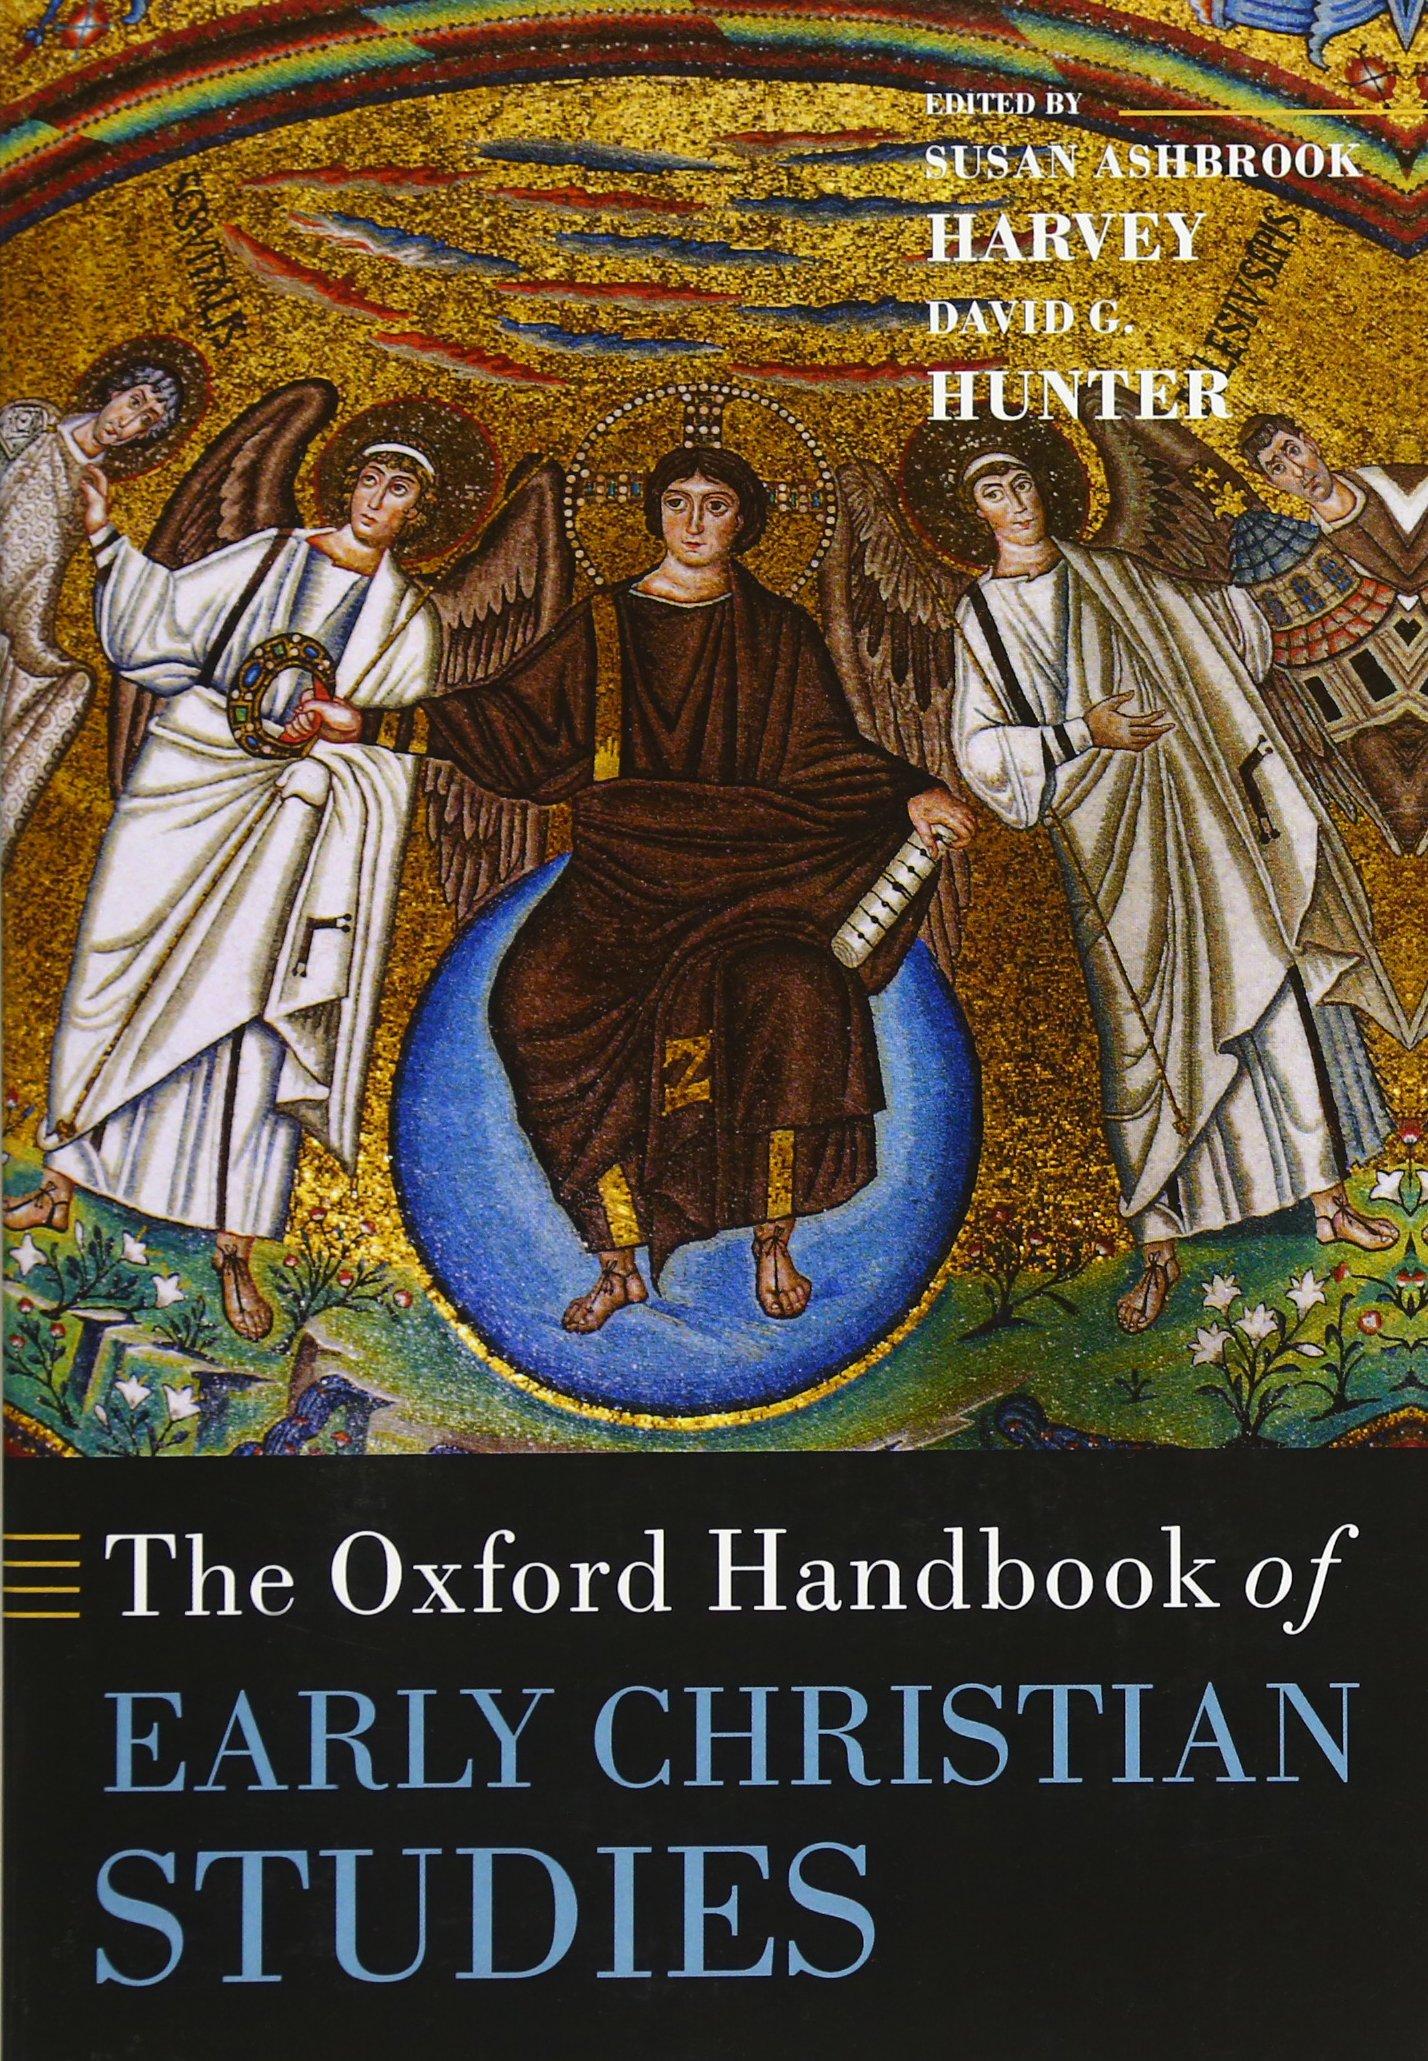 The Oxford Handbook of Early Christian Studies (Inglese) Copertina flessibile – 11 nov 2010 Susan Ashbrook Harvey David G. Hunter OUP Oxford 0199596522